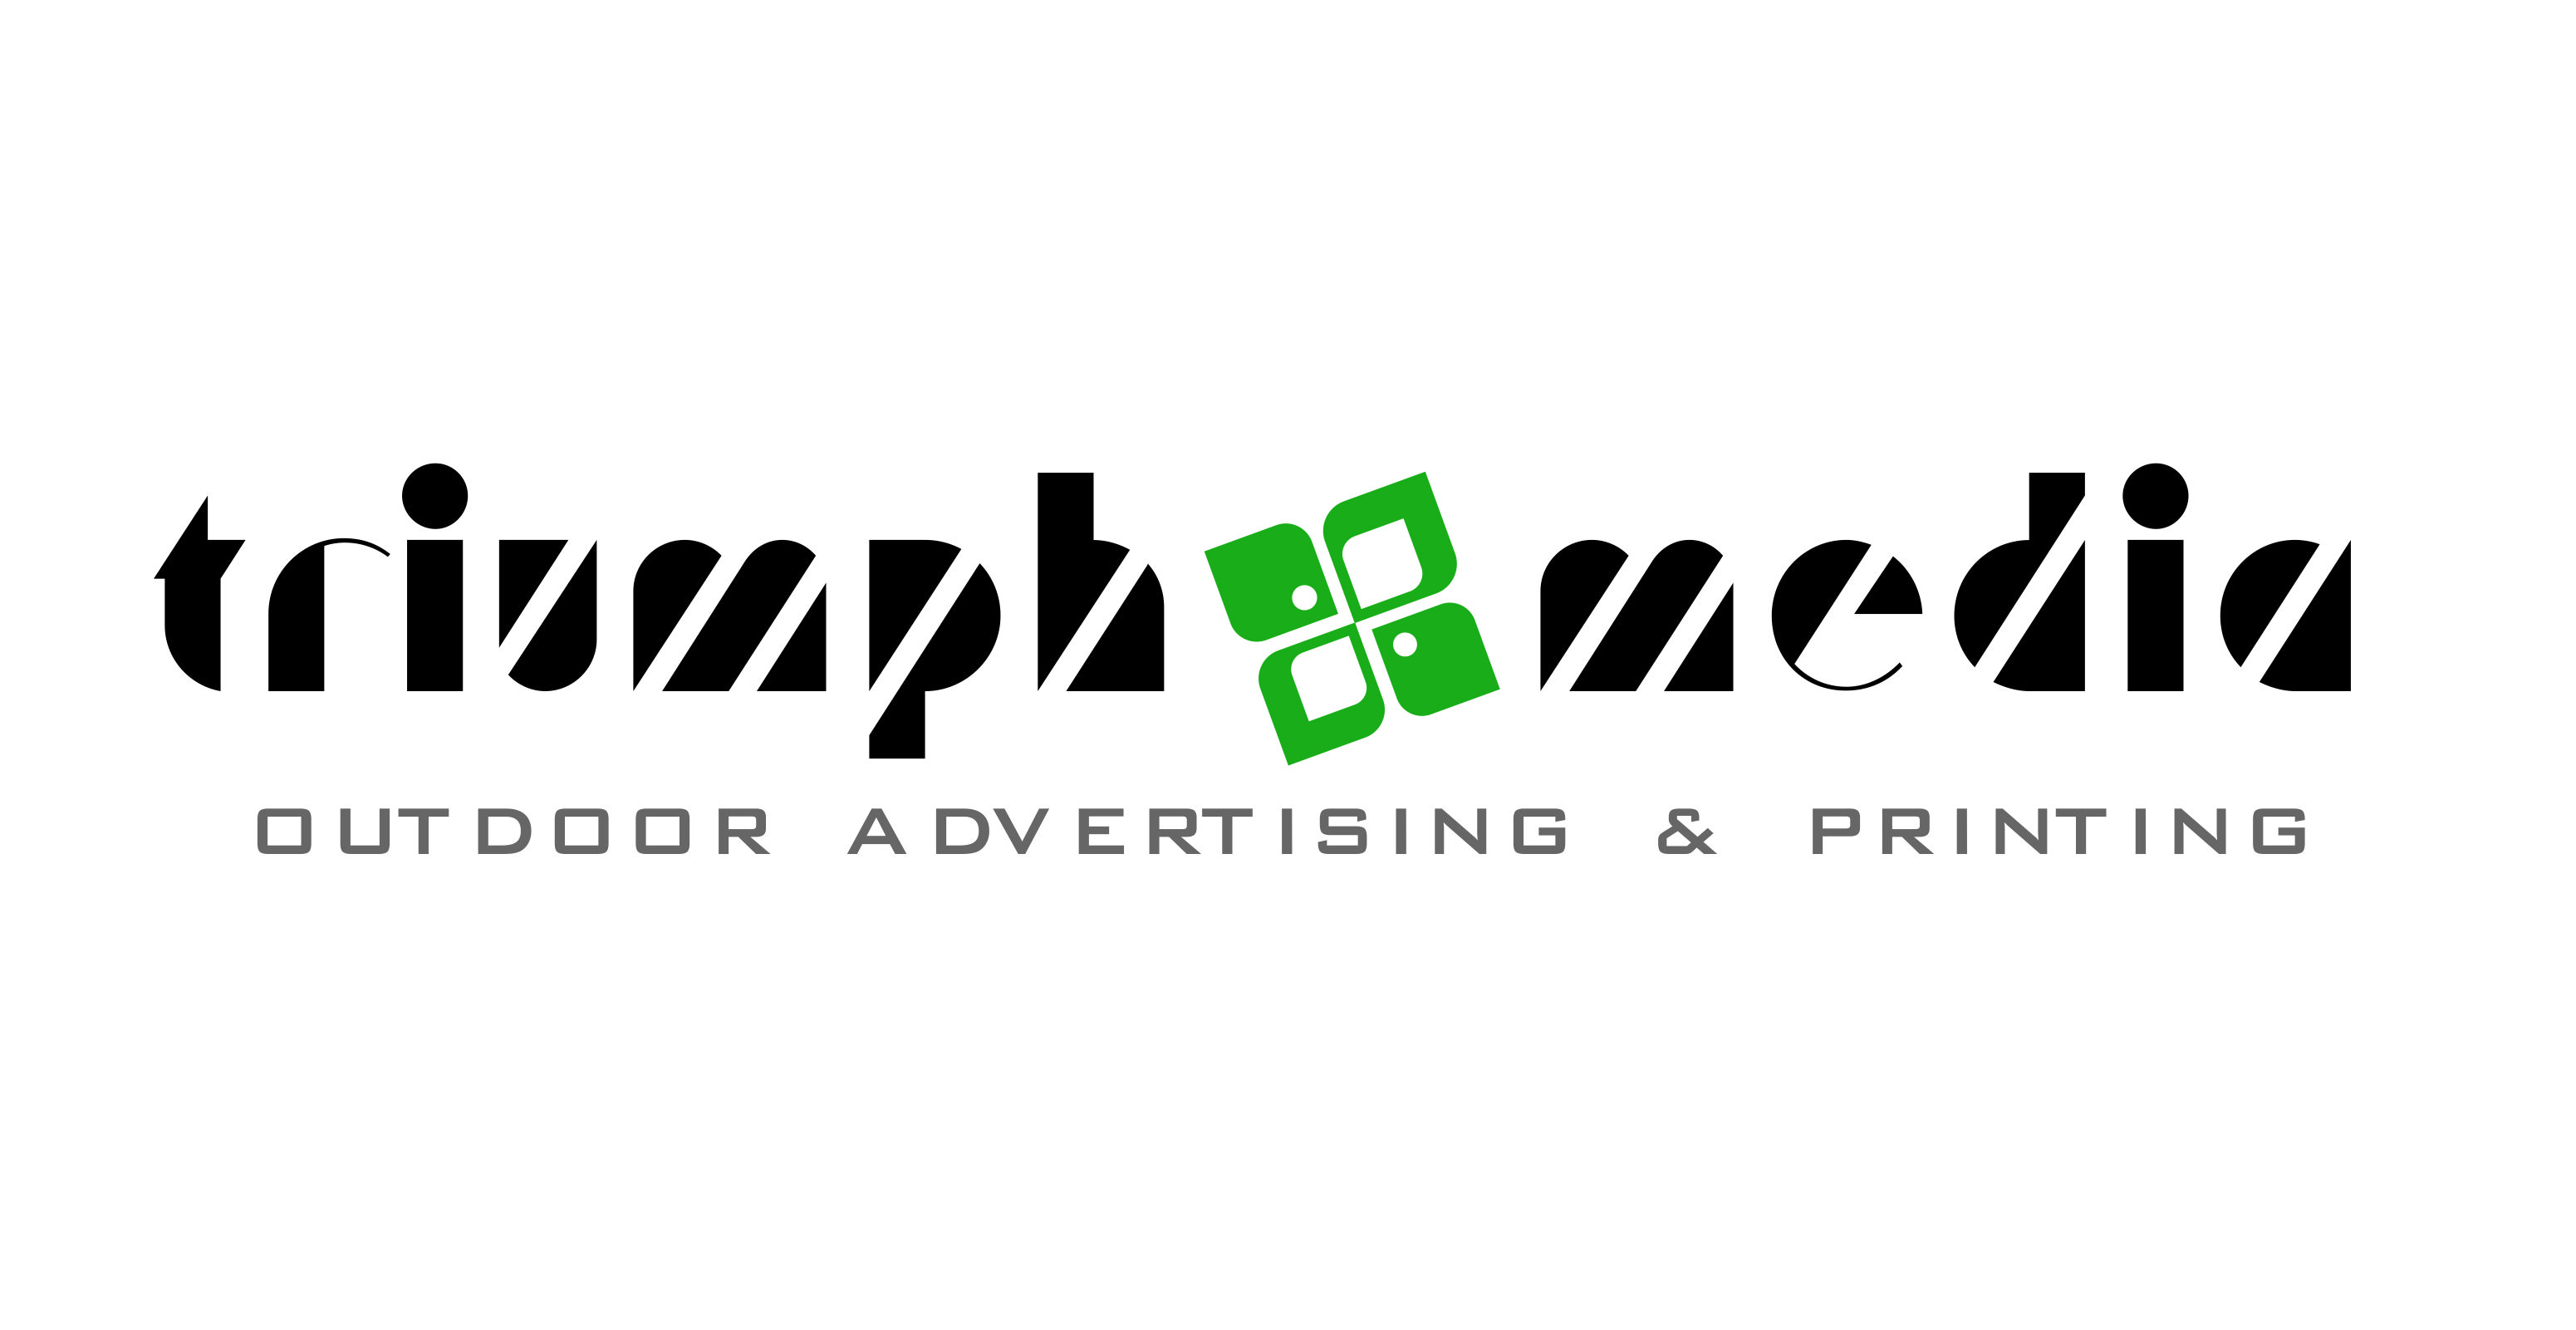 Разработка логотипа  TRIUMPH MEDIA с изображением клевера фото f_50747cfc35fdb.jpg